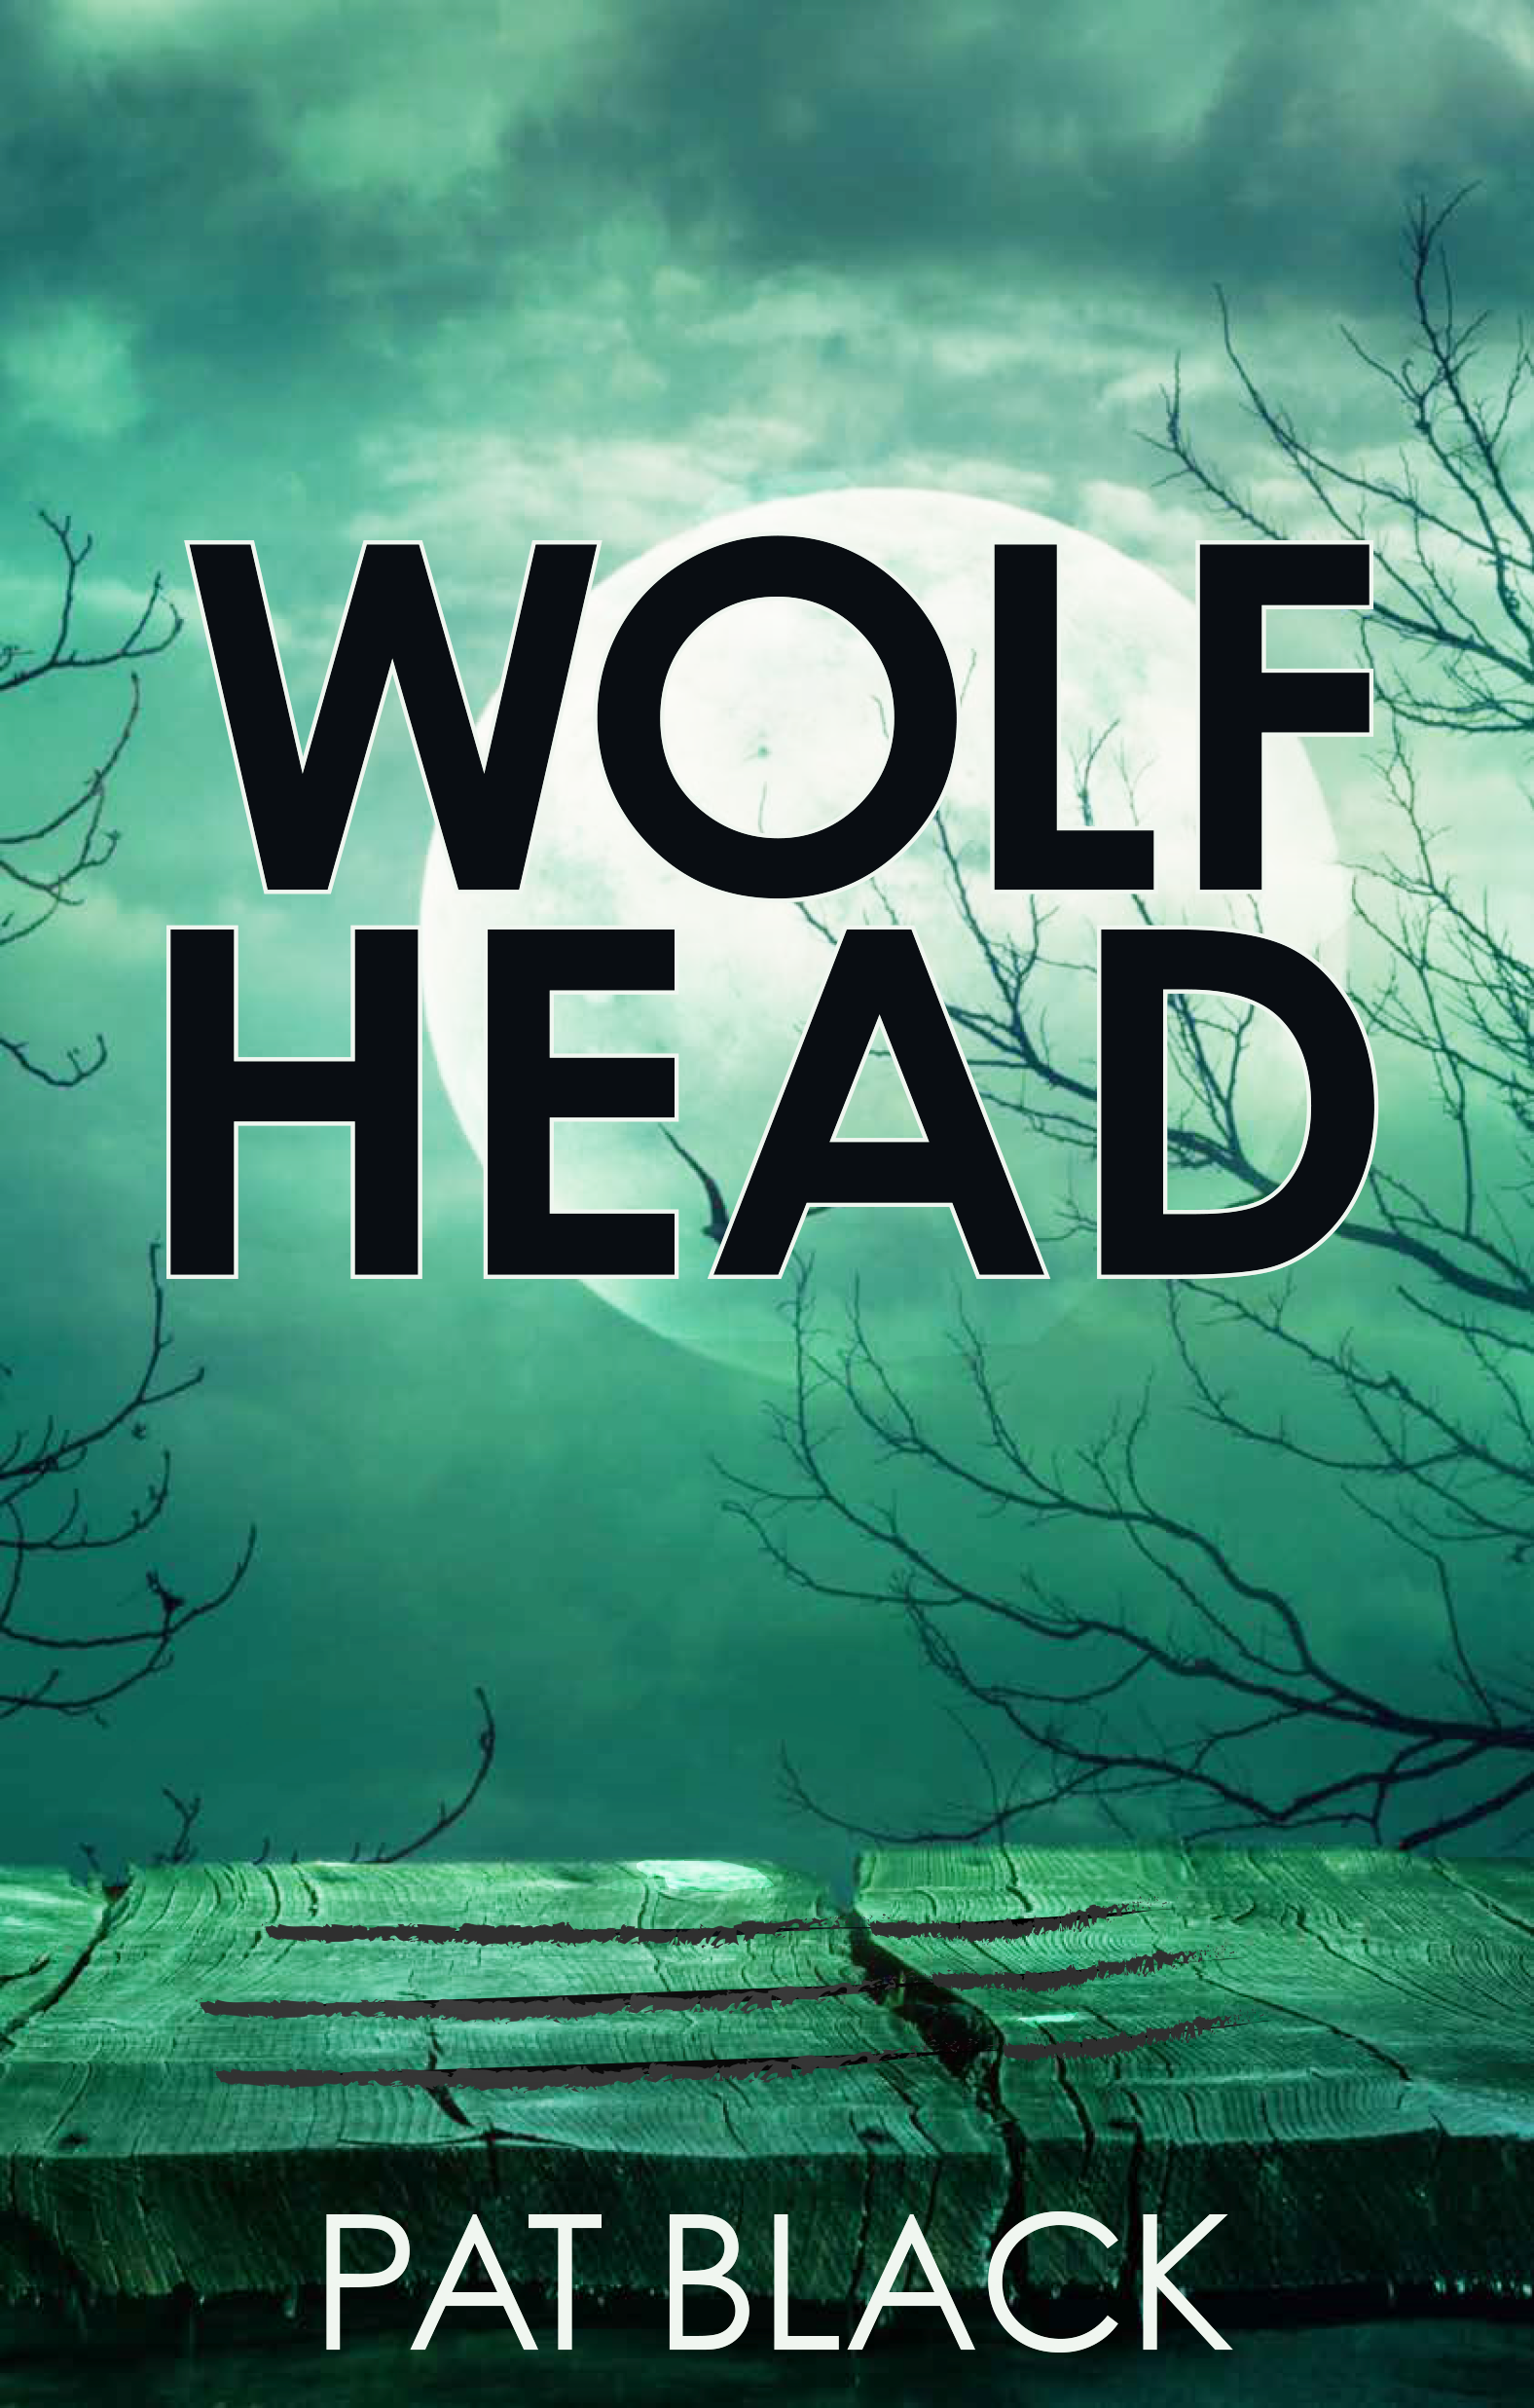 Wolf Head copy